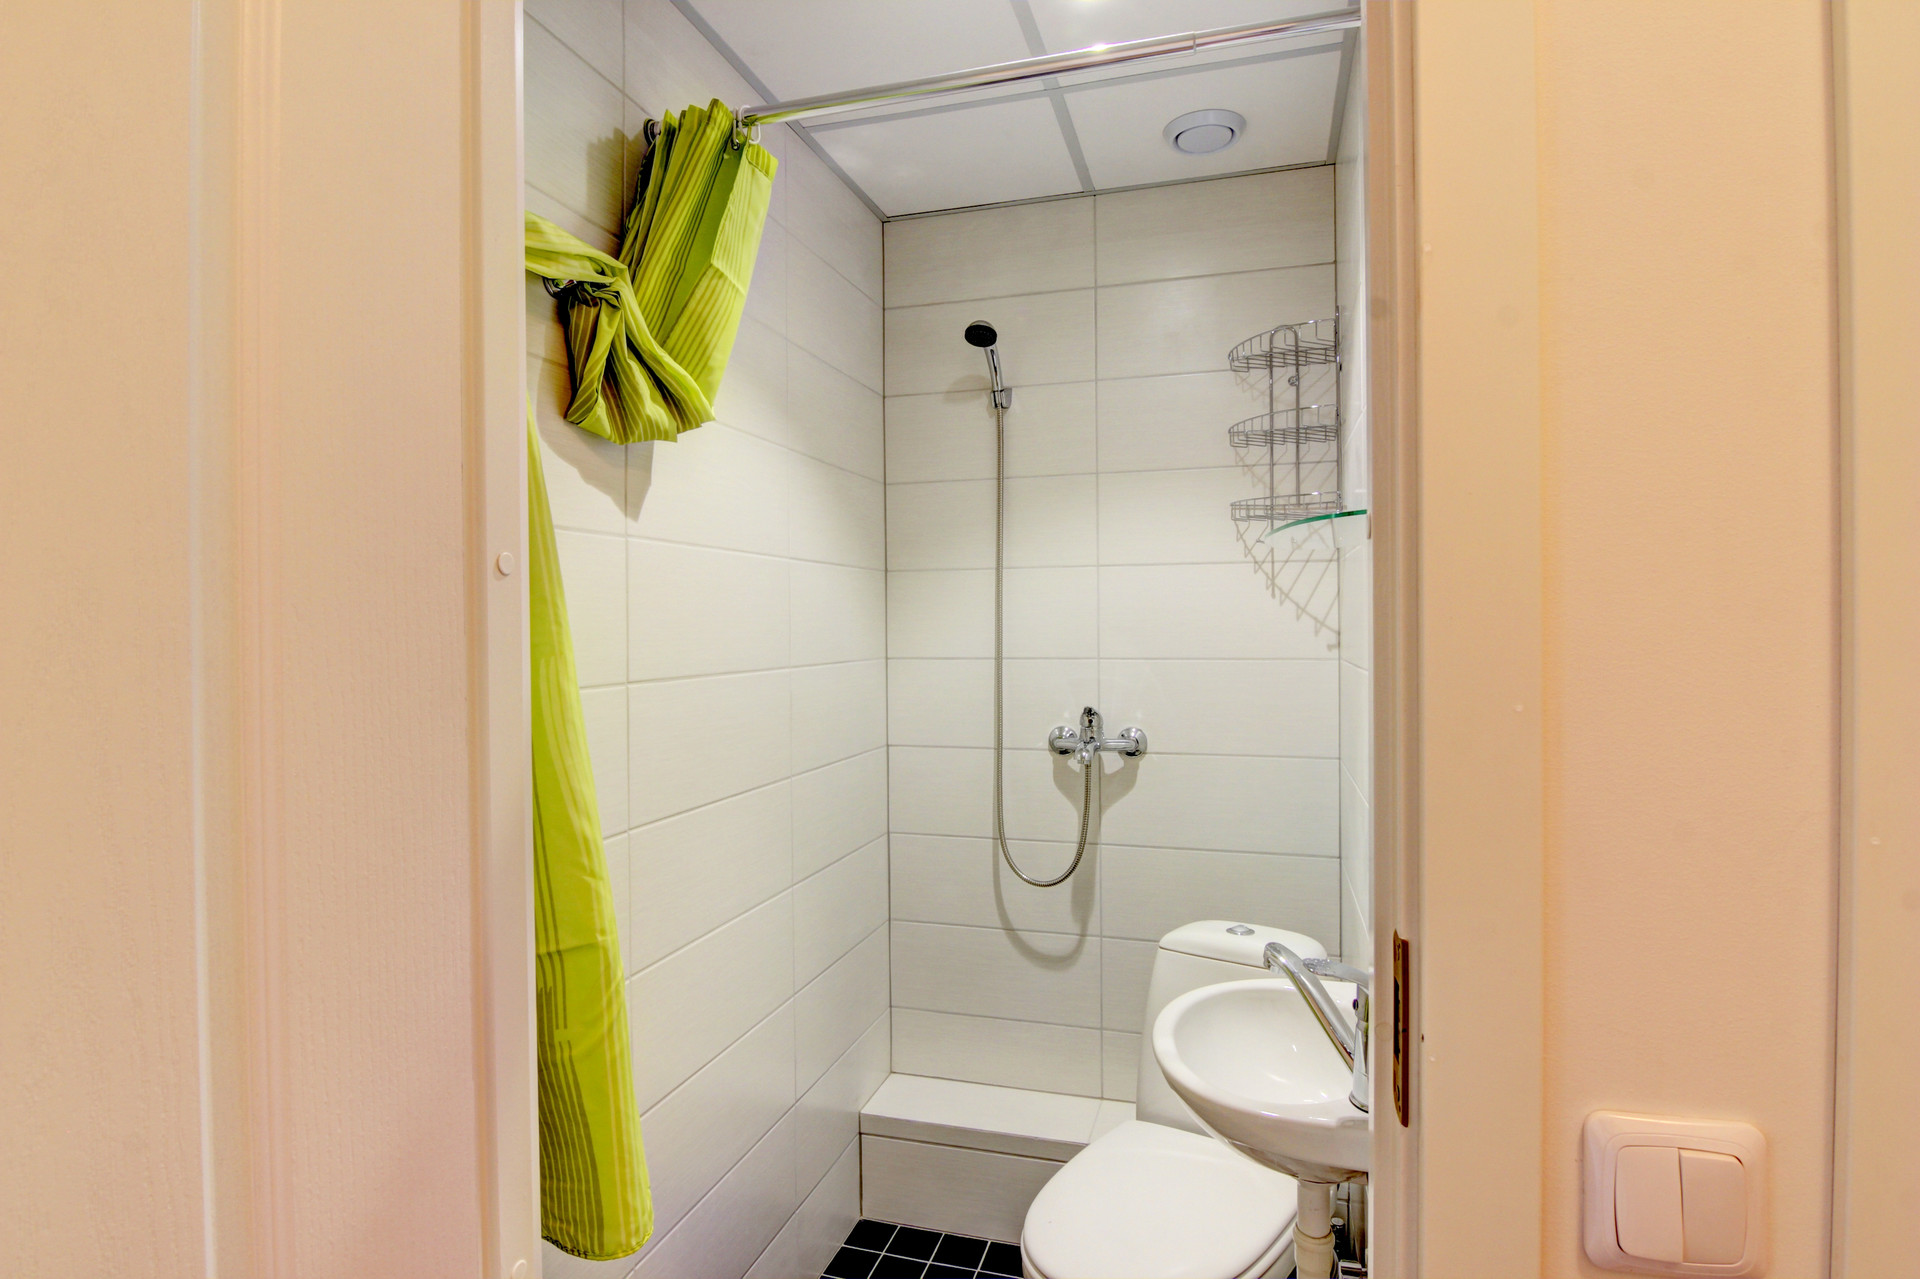 Cozy room in 5-room apartment in Baltupiai area